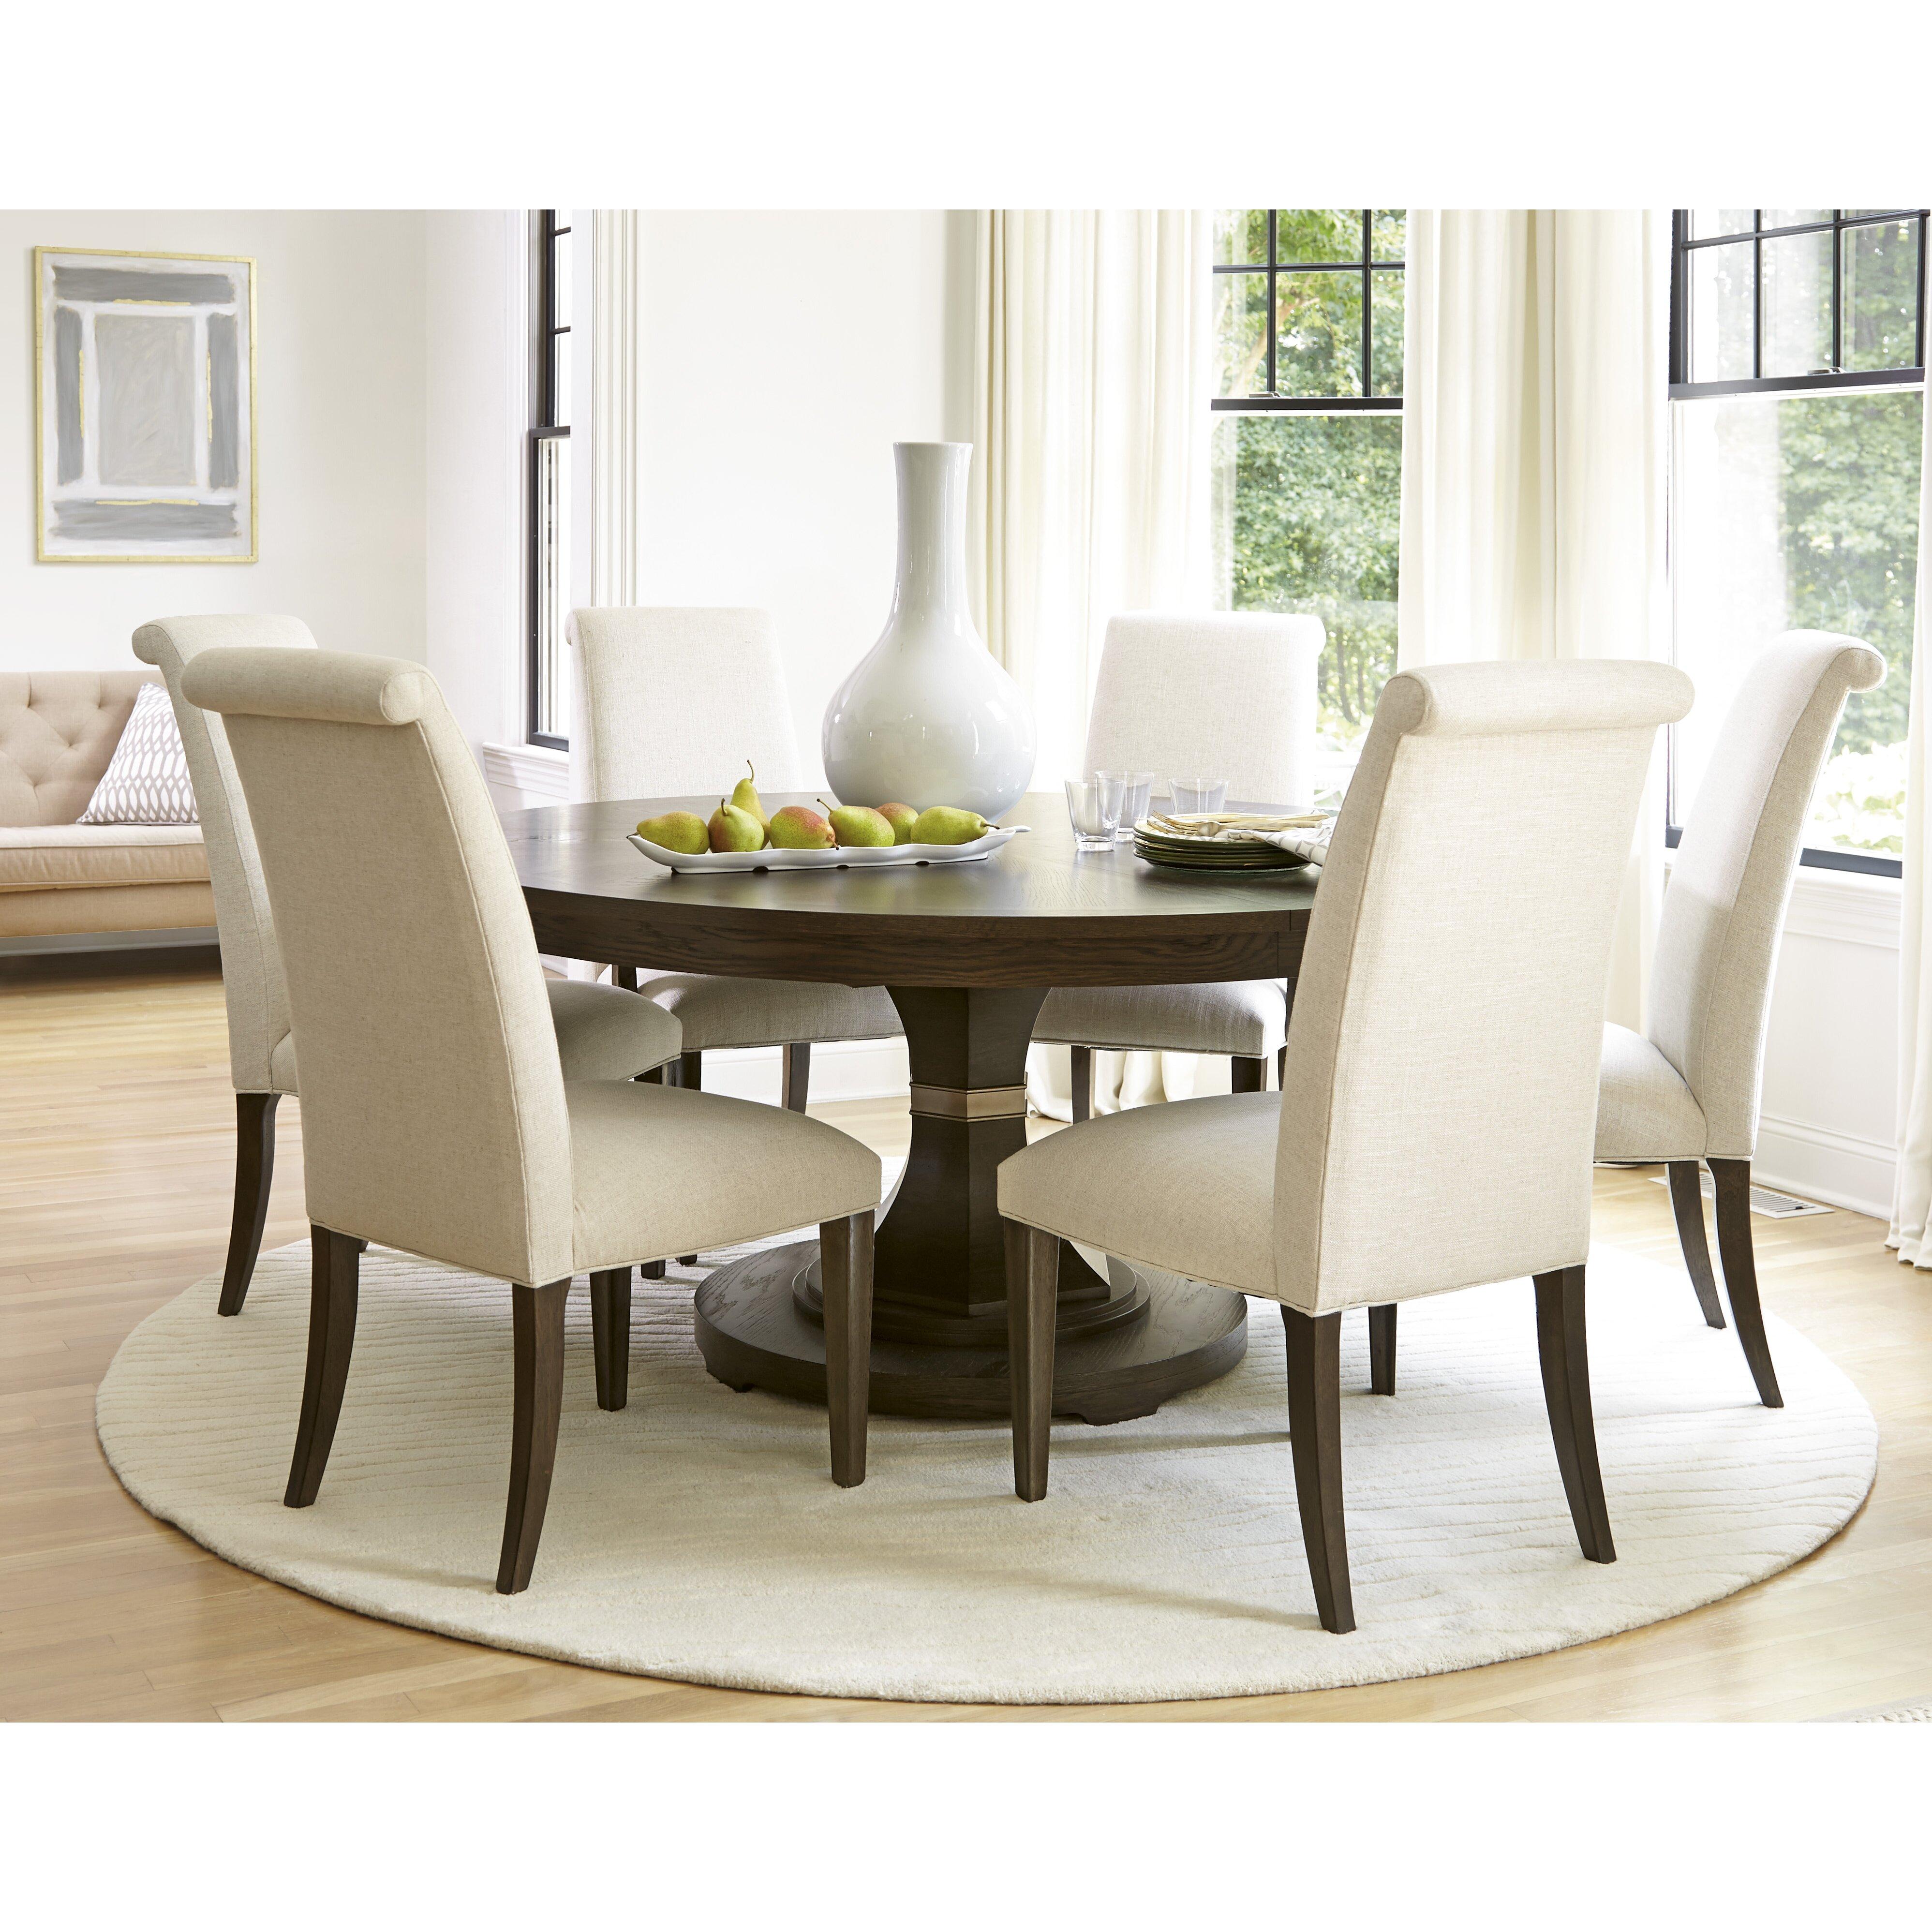 furniture kitchen dining furniture 7 piece kitchen and dining